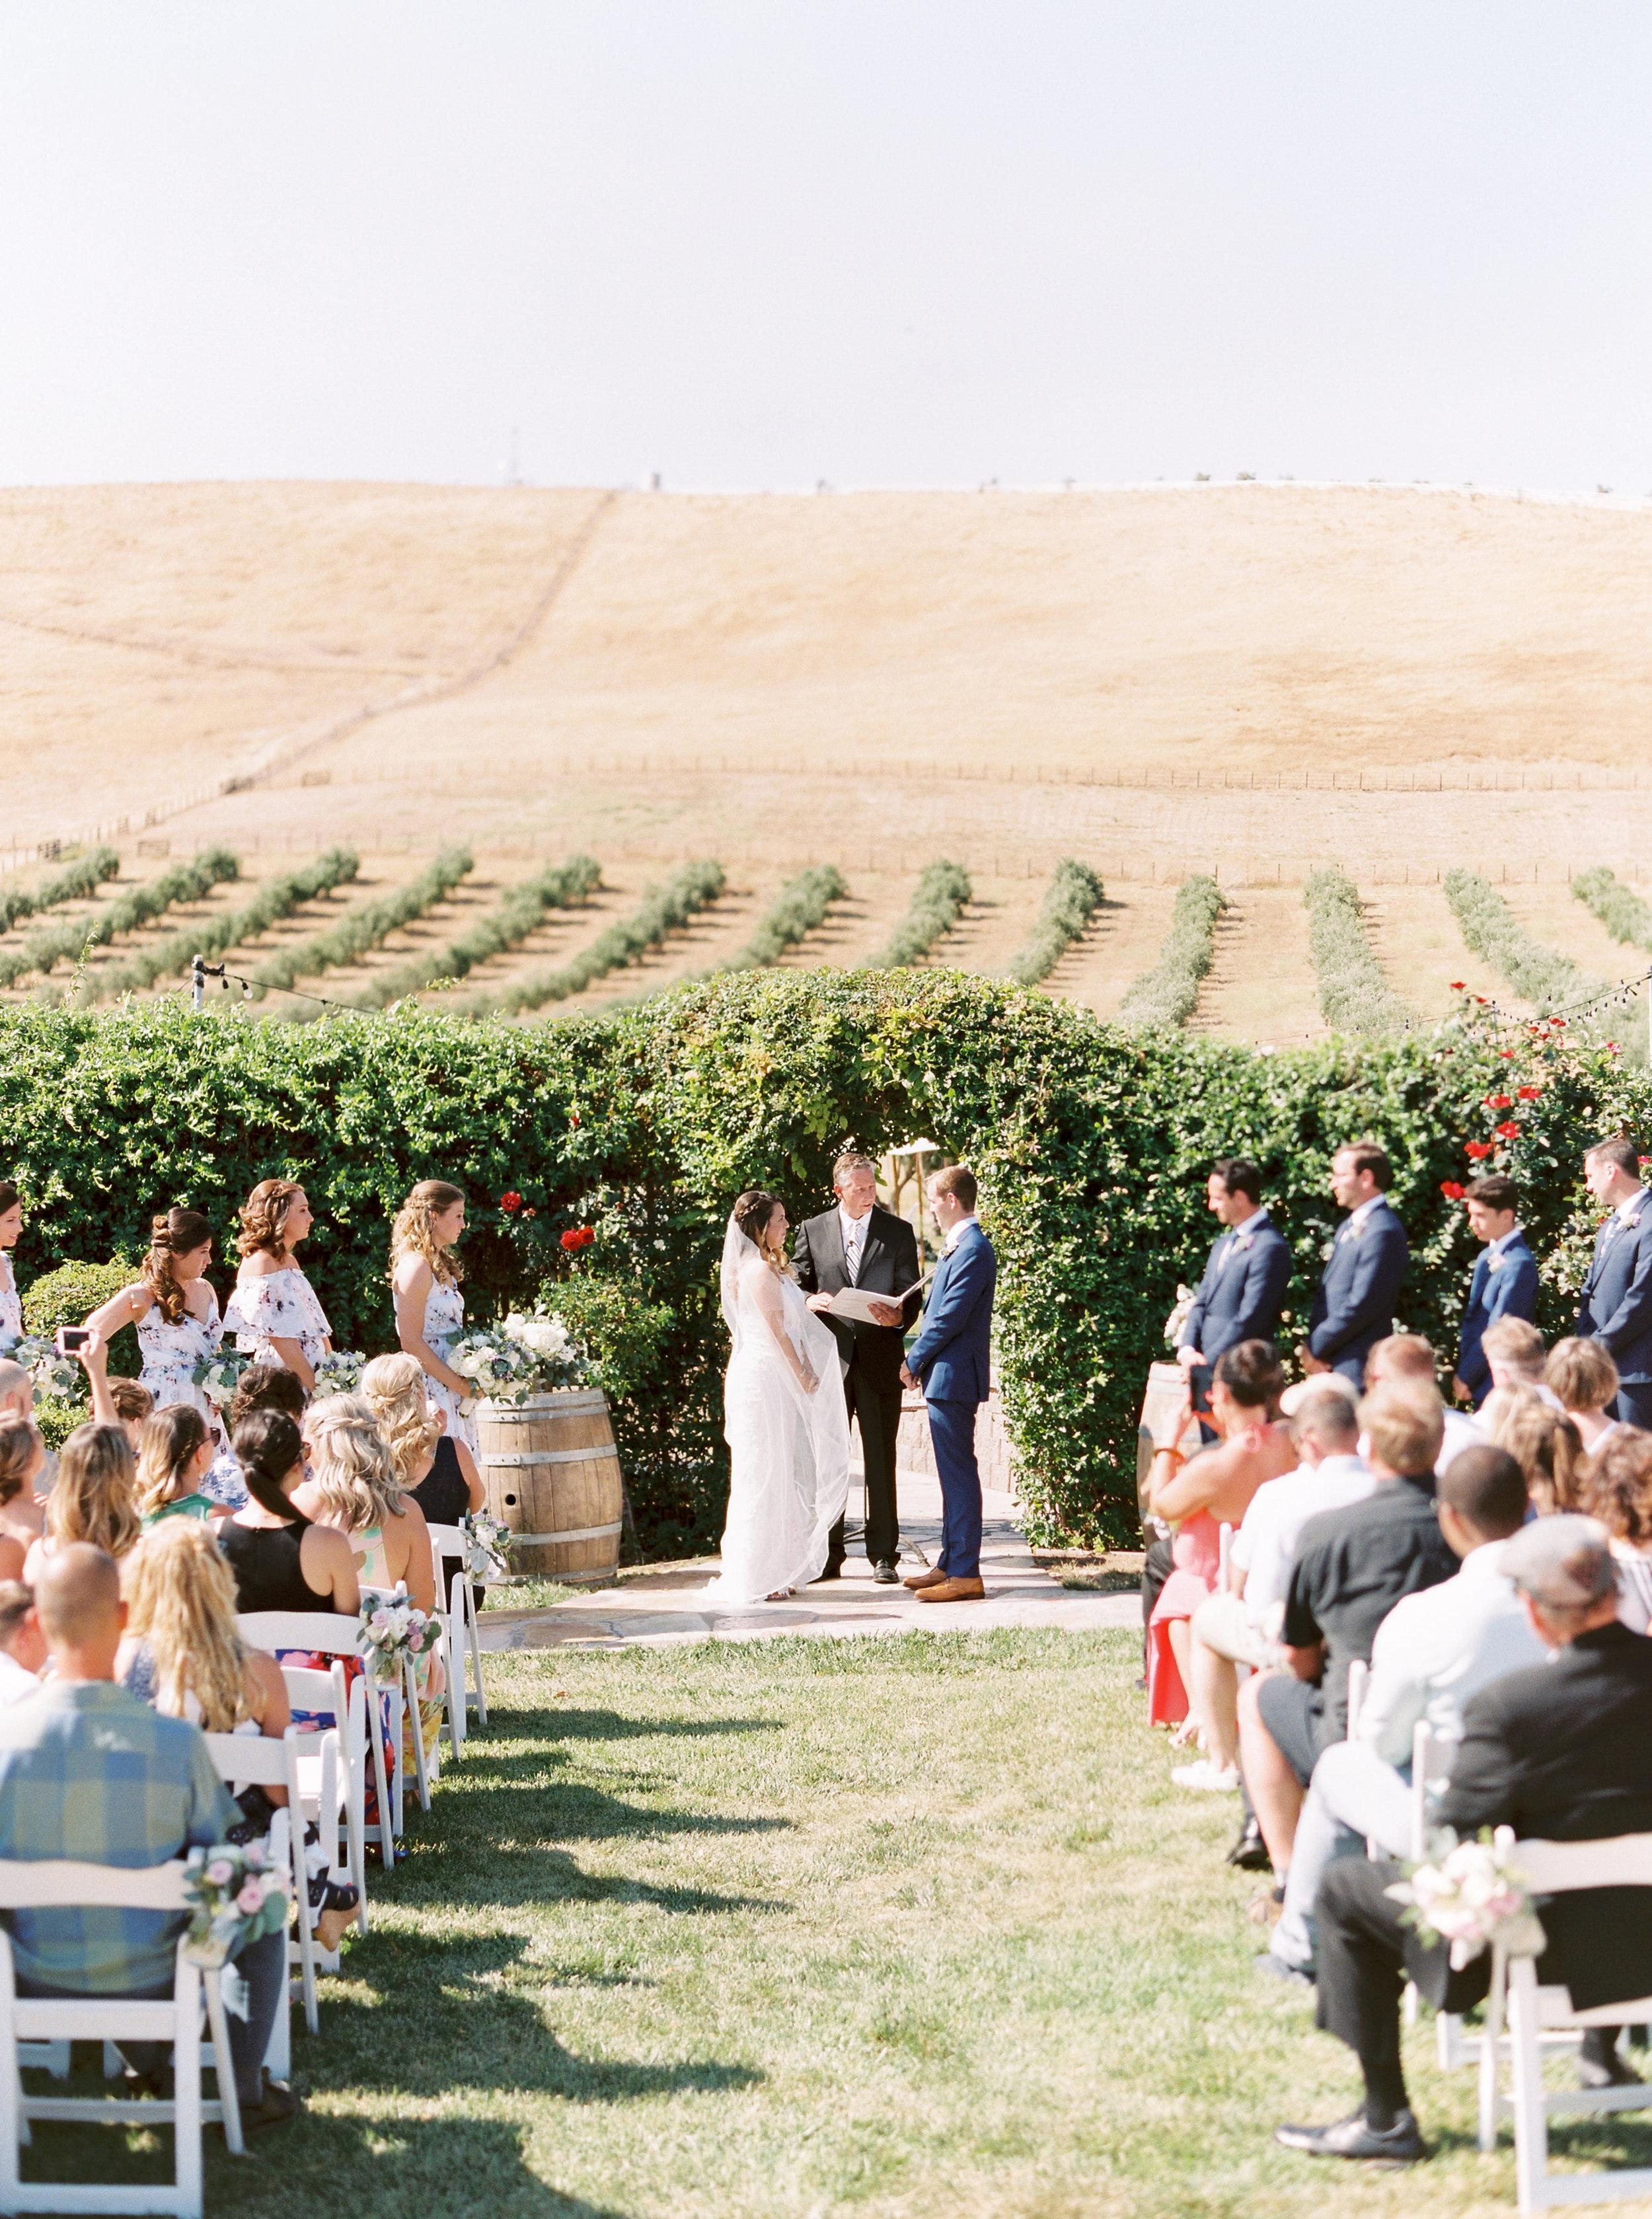 the-purple-orchid-resort-wedding-in-livermore-california-163.jpg